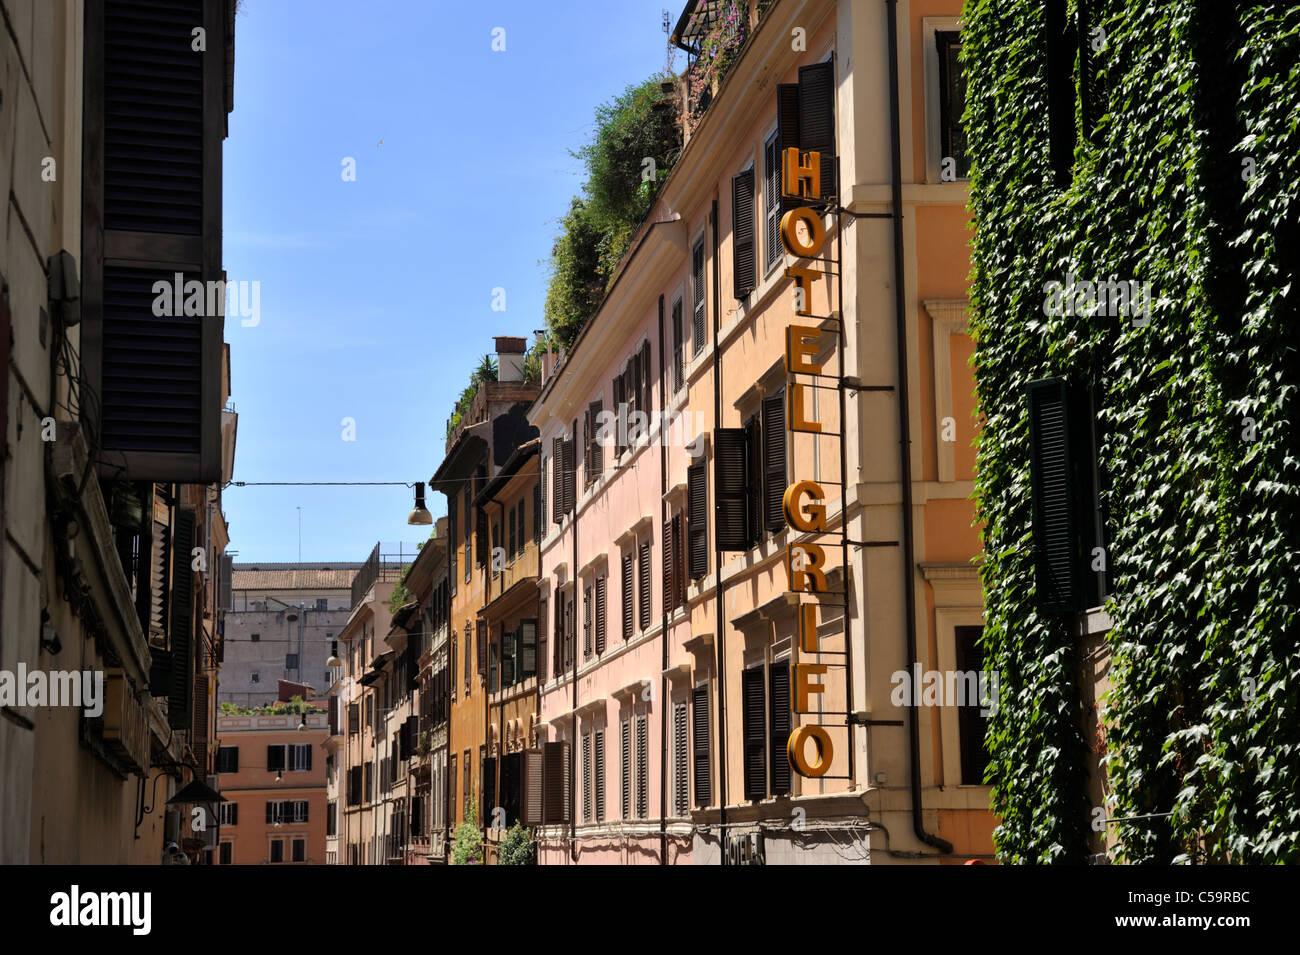 Italien, Rom, Monti Viertel, via del boschetto Stockbild